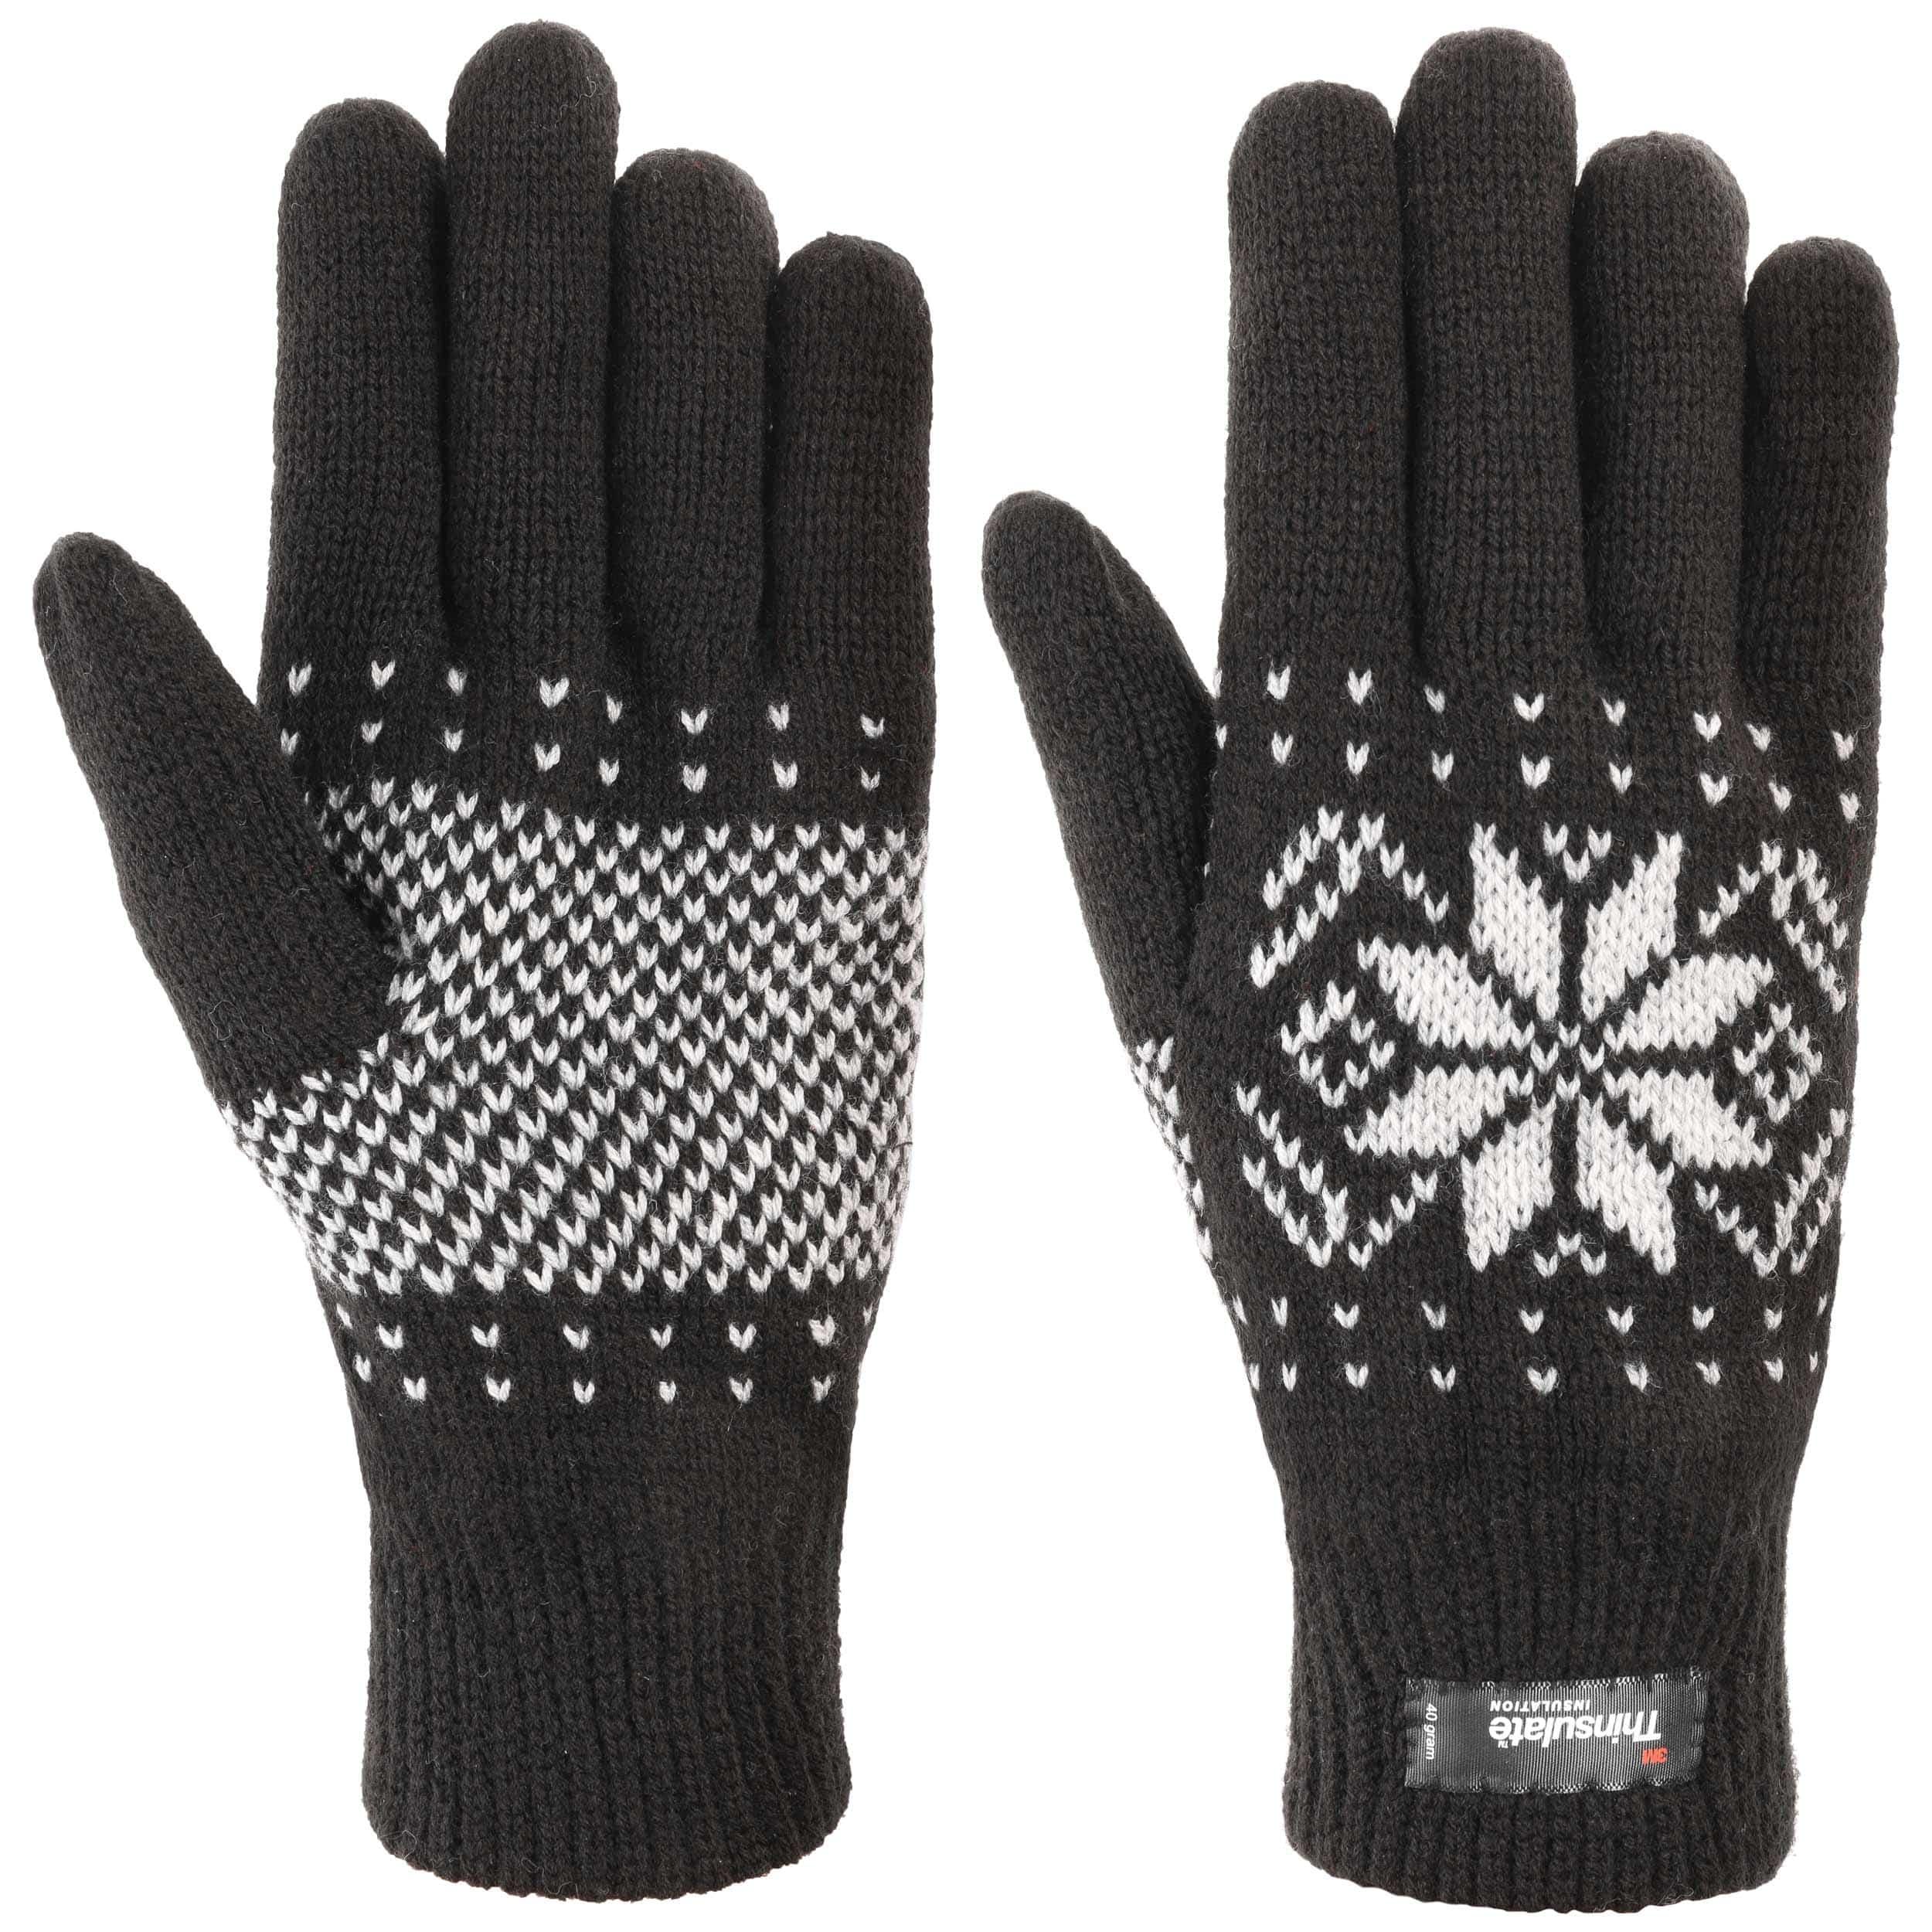 snowflake thinsulate handschoenen by lipodo 15,95 \u20acsnowflake thinsulate handschoenen by lipodo zwart 3